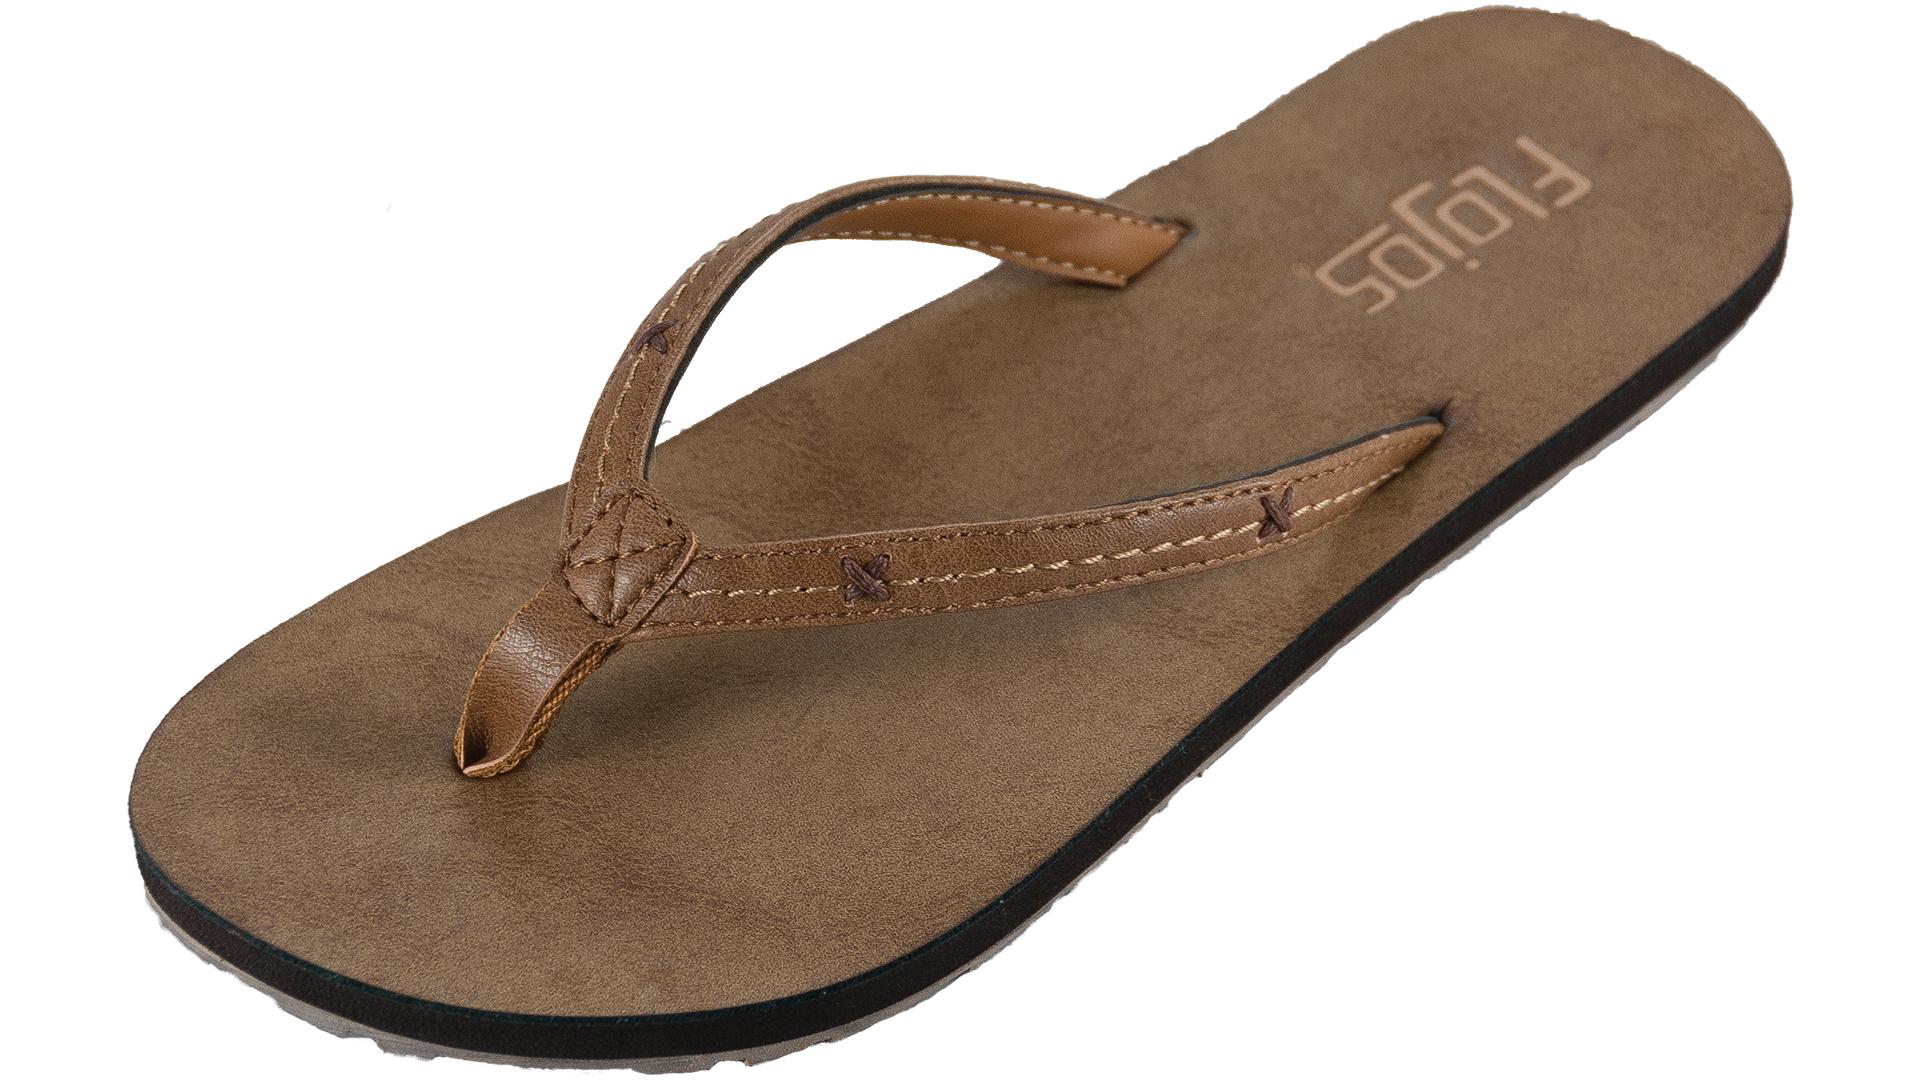 36b391ca390d89 Flojos Womens Rita Flip Flop Sandal